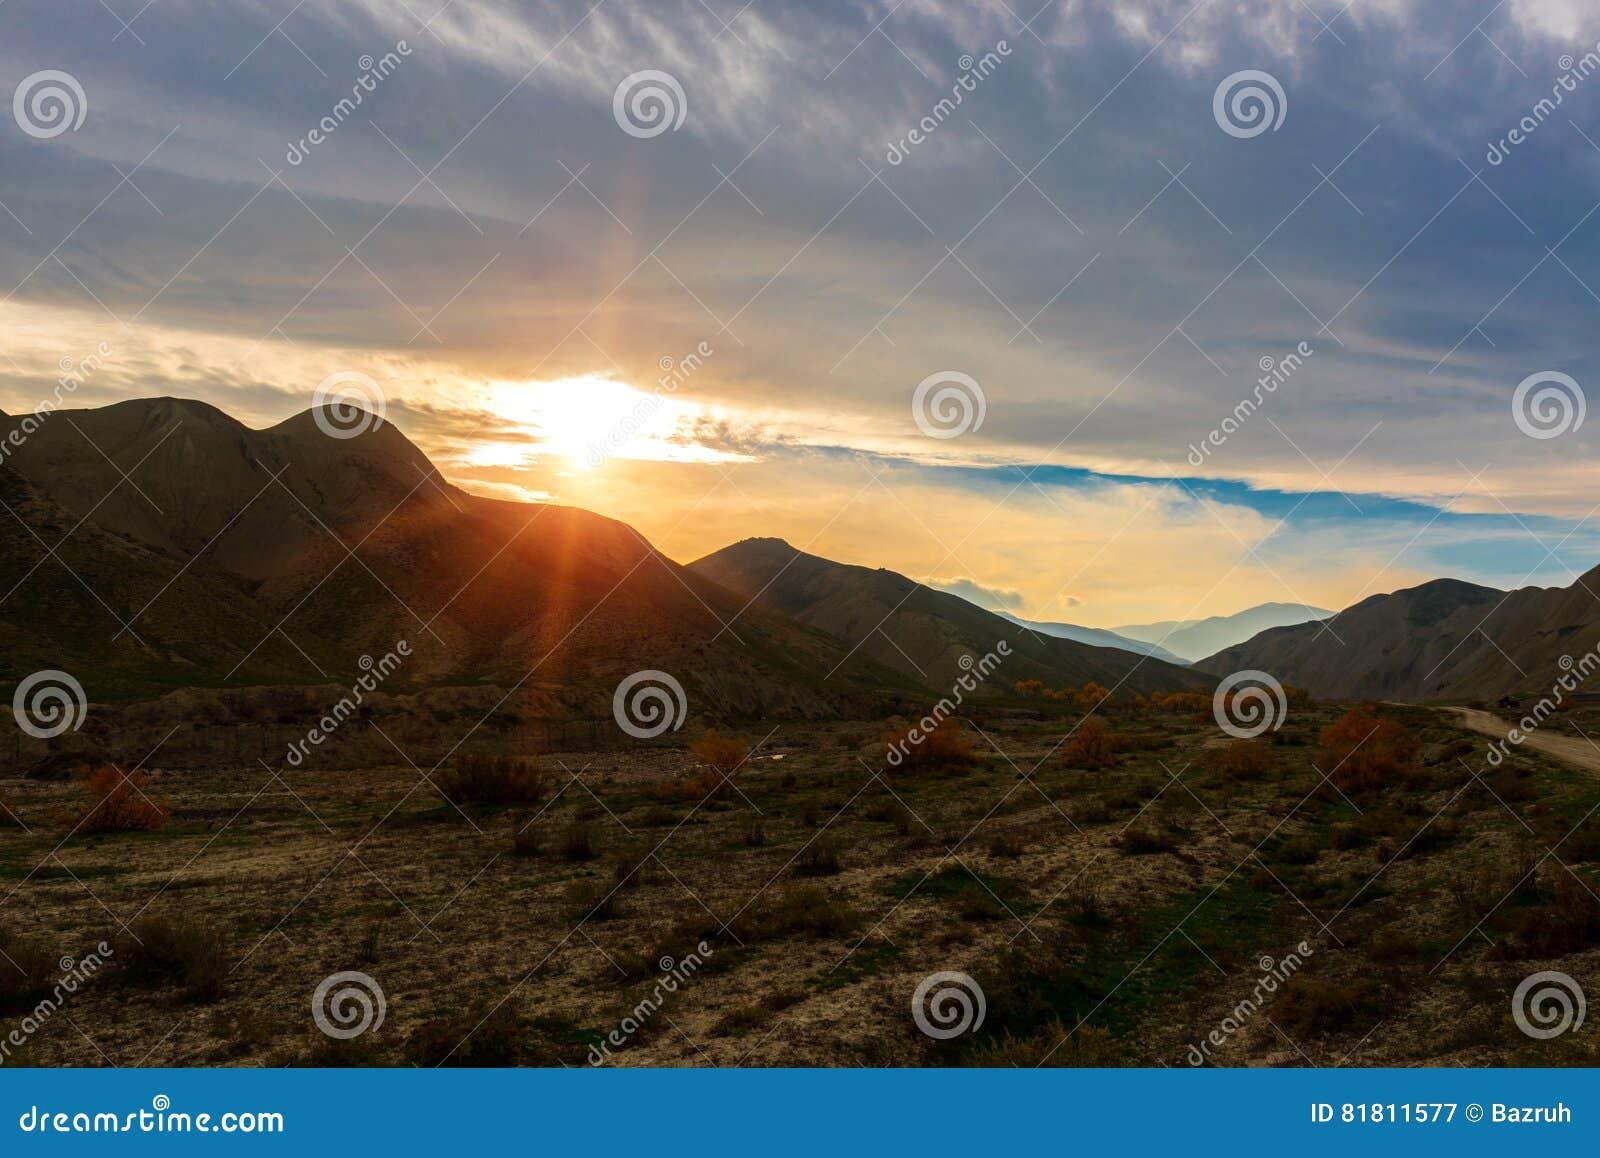 Красивый заход солнца в горе